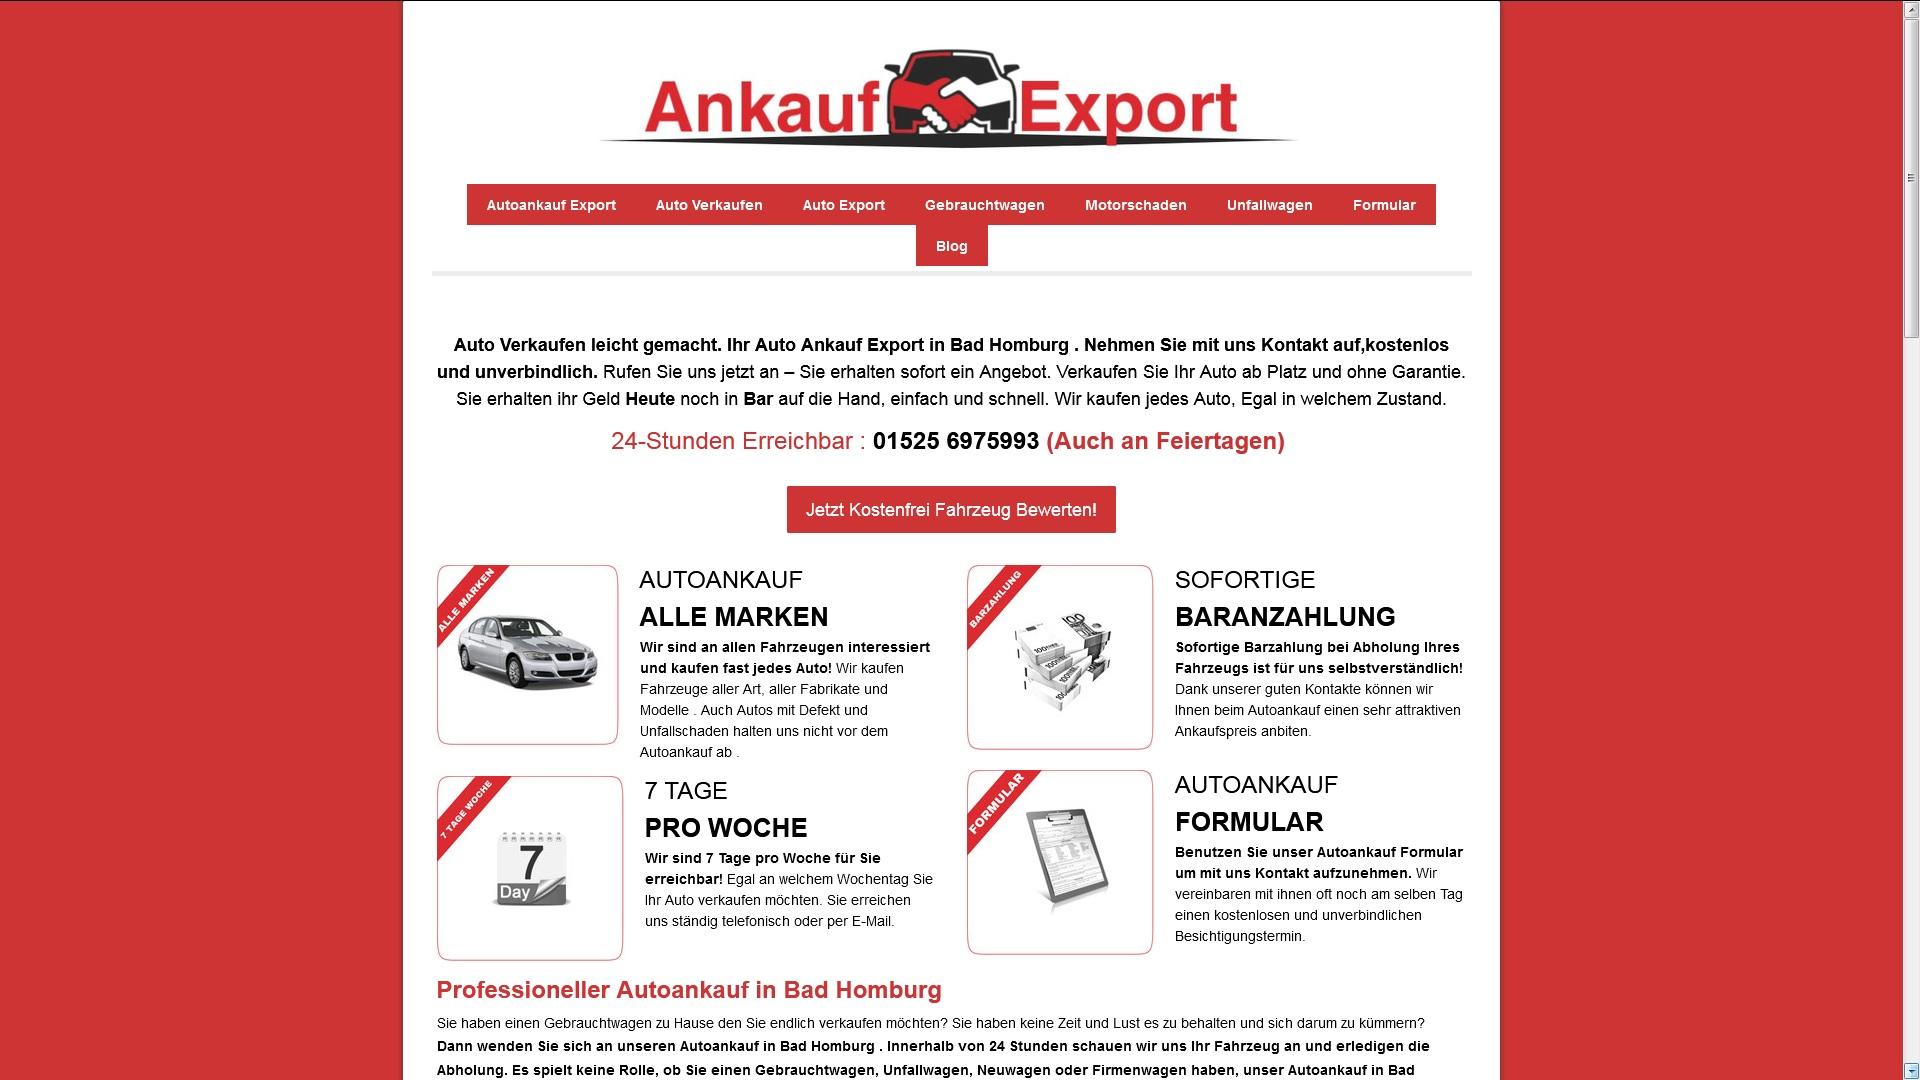 Autoanakuf Lüneburg